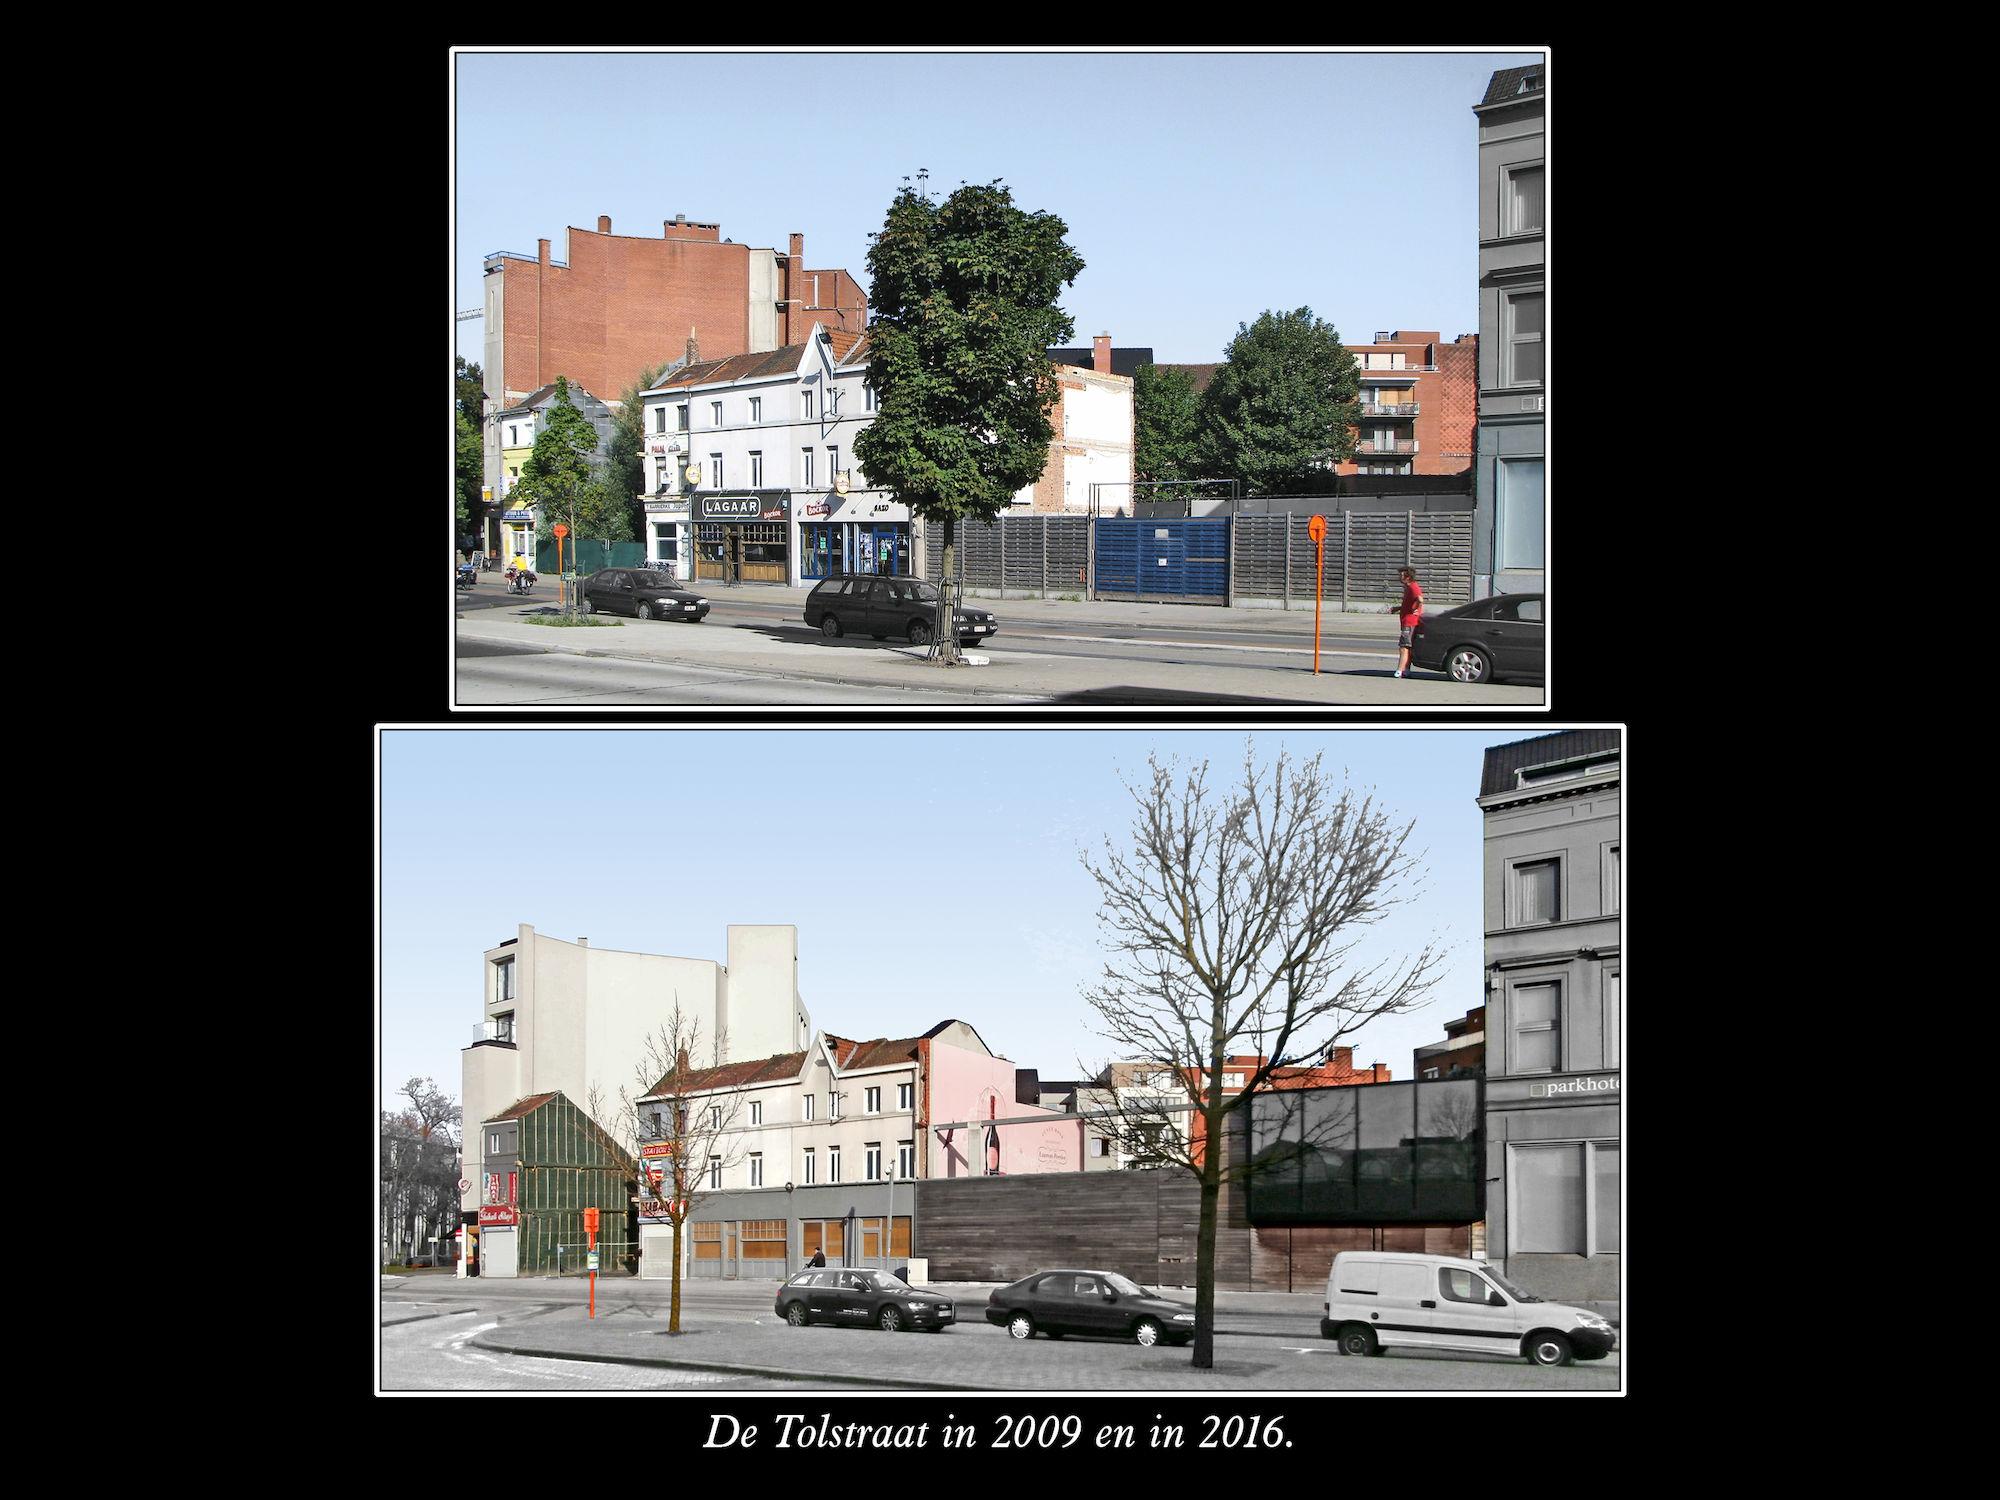 Tolstraat 2009 en 2016